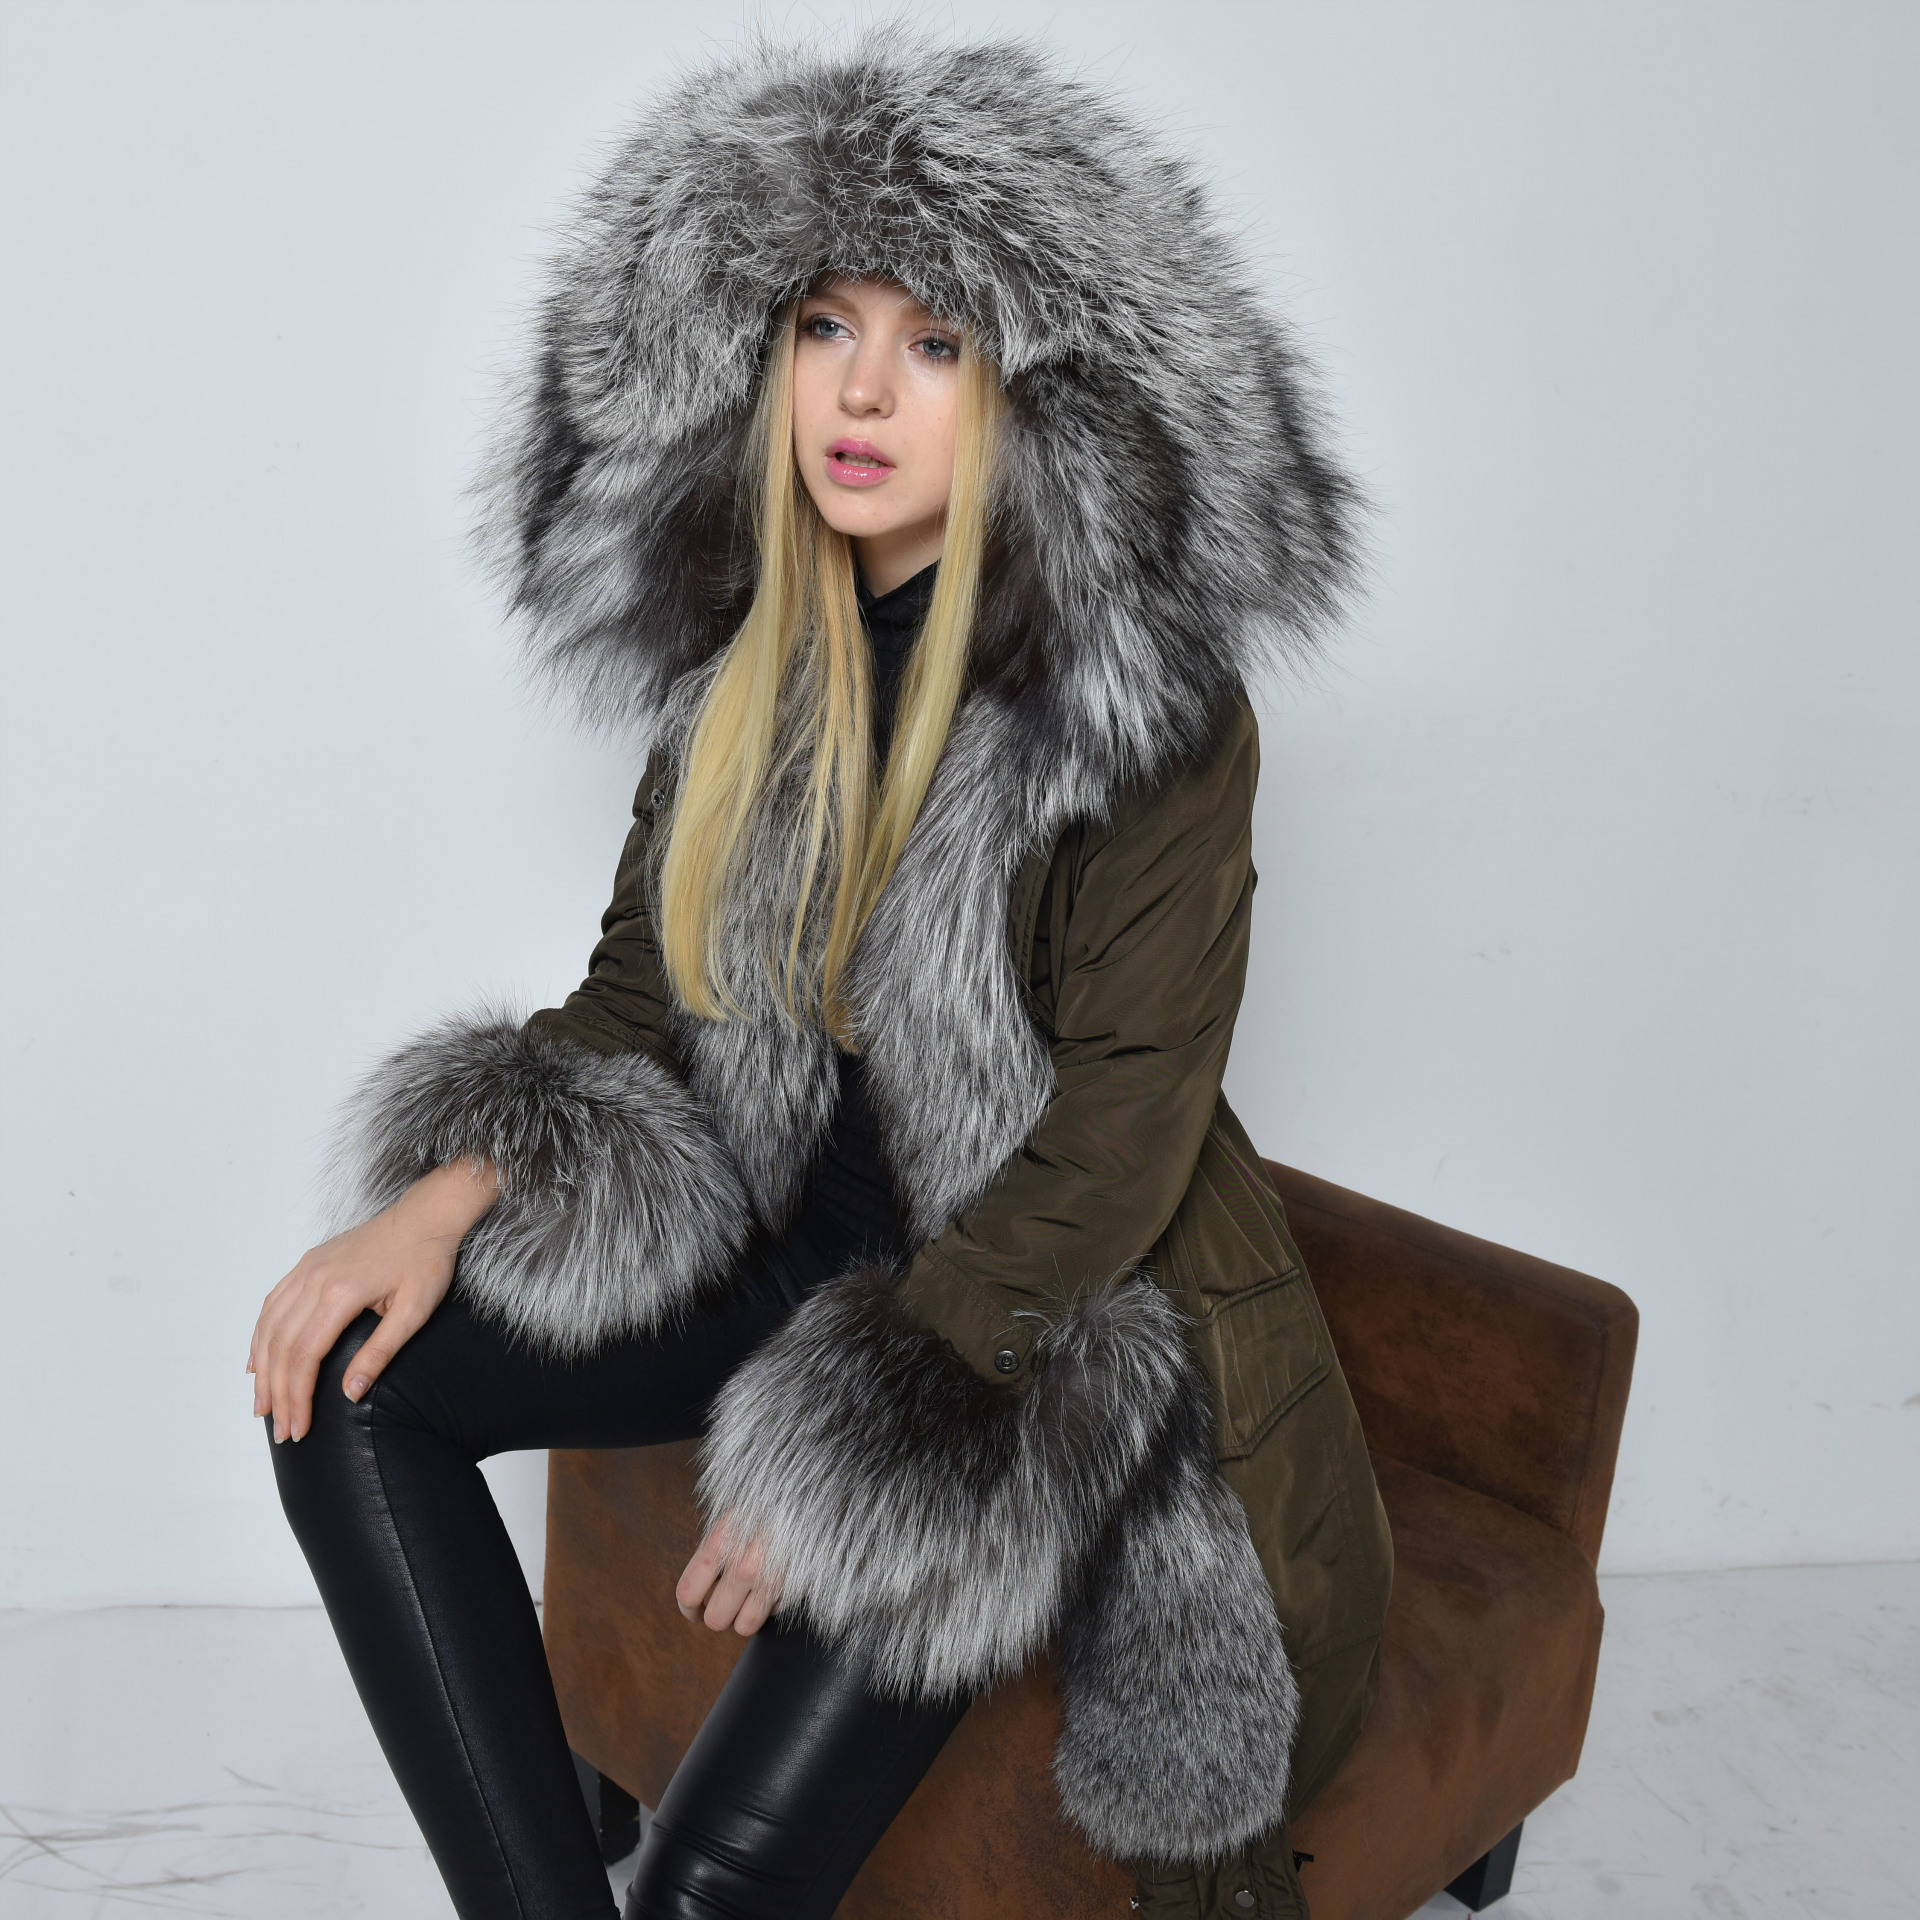 383795688c63 Super Silver Fox Fur Brand Down Coat New Winter Women s Luxurious Long Down  Jackets Female Thicken Outerwear Parkas YR08